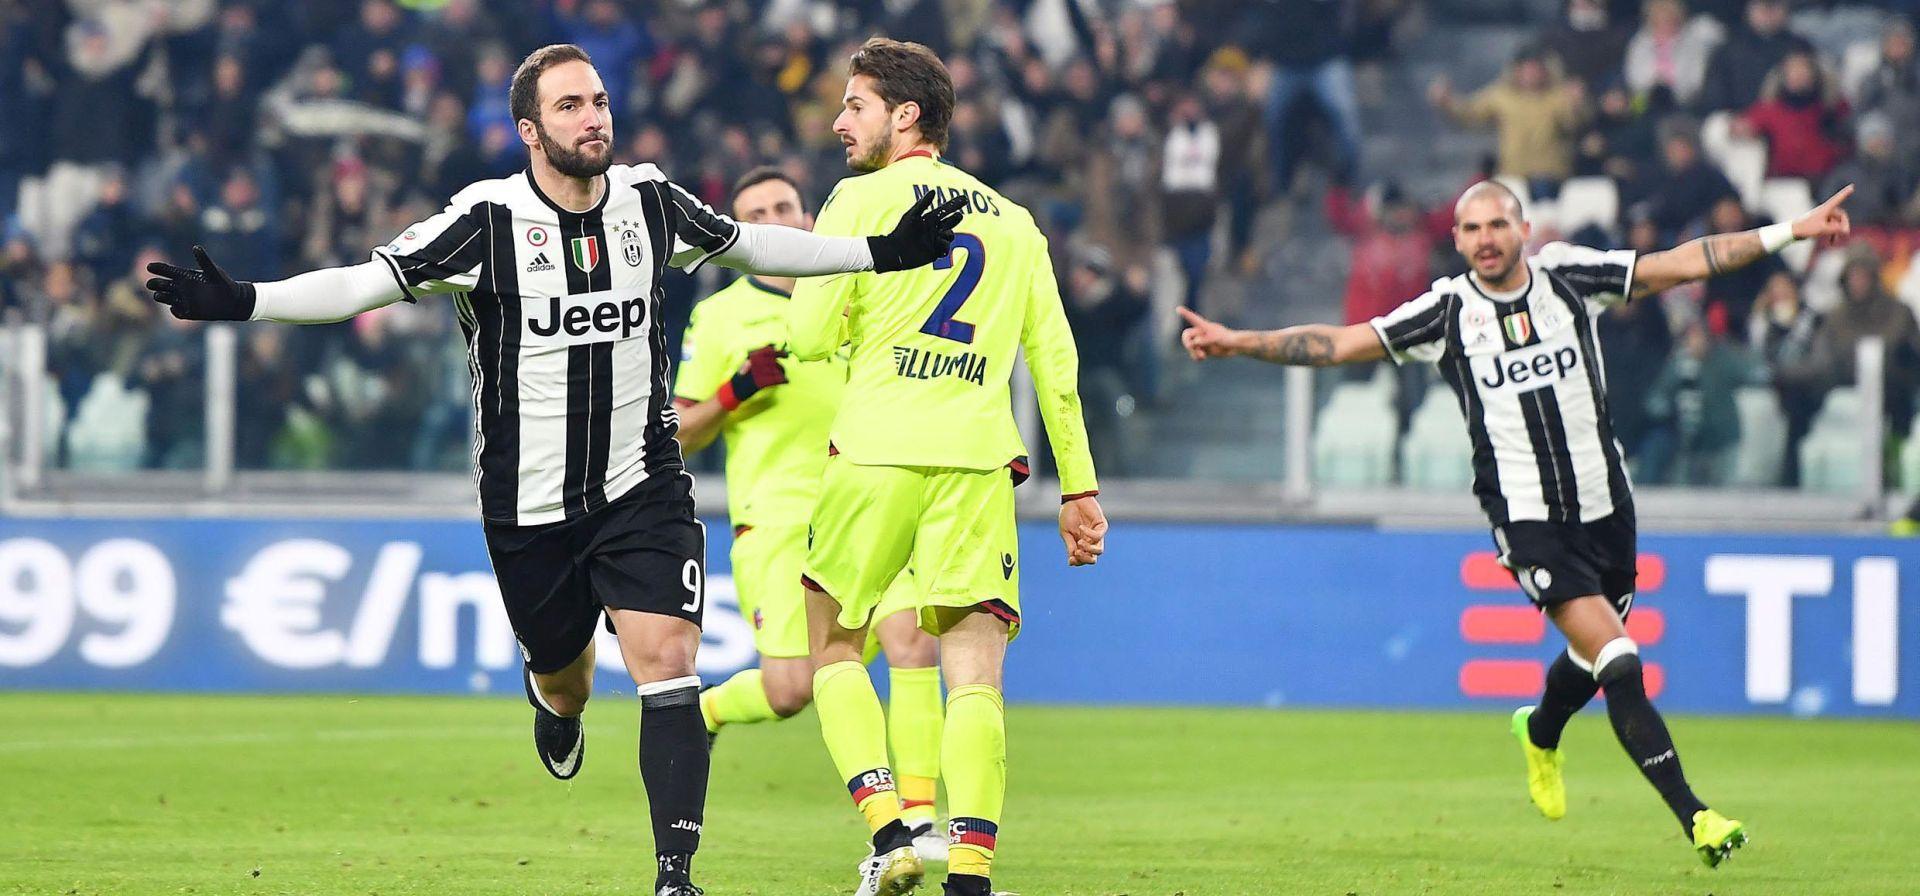 SERIE A Slavlje Juventusa, dva gola Higuaina